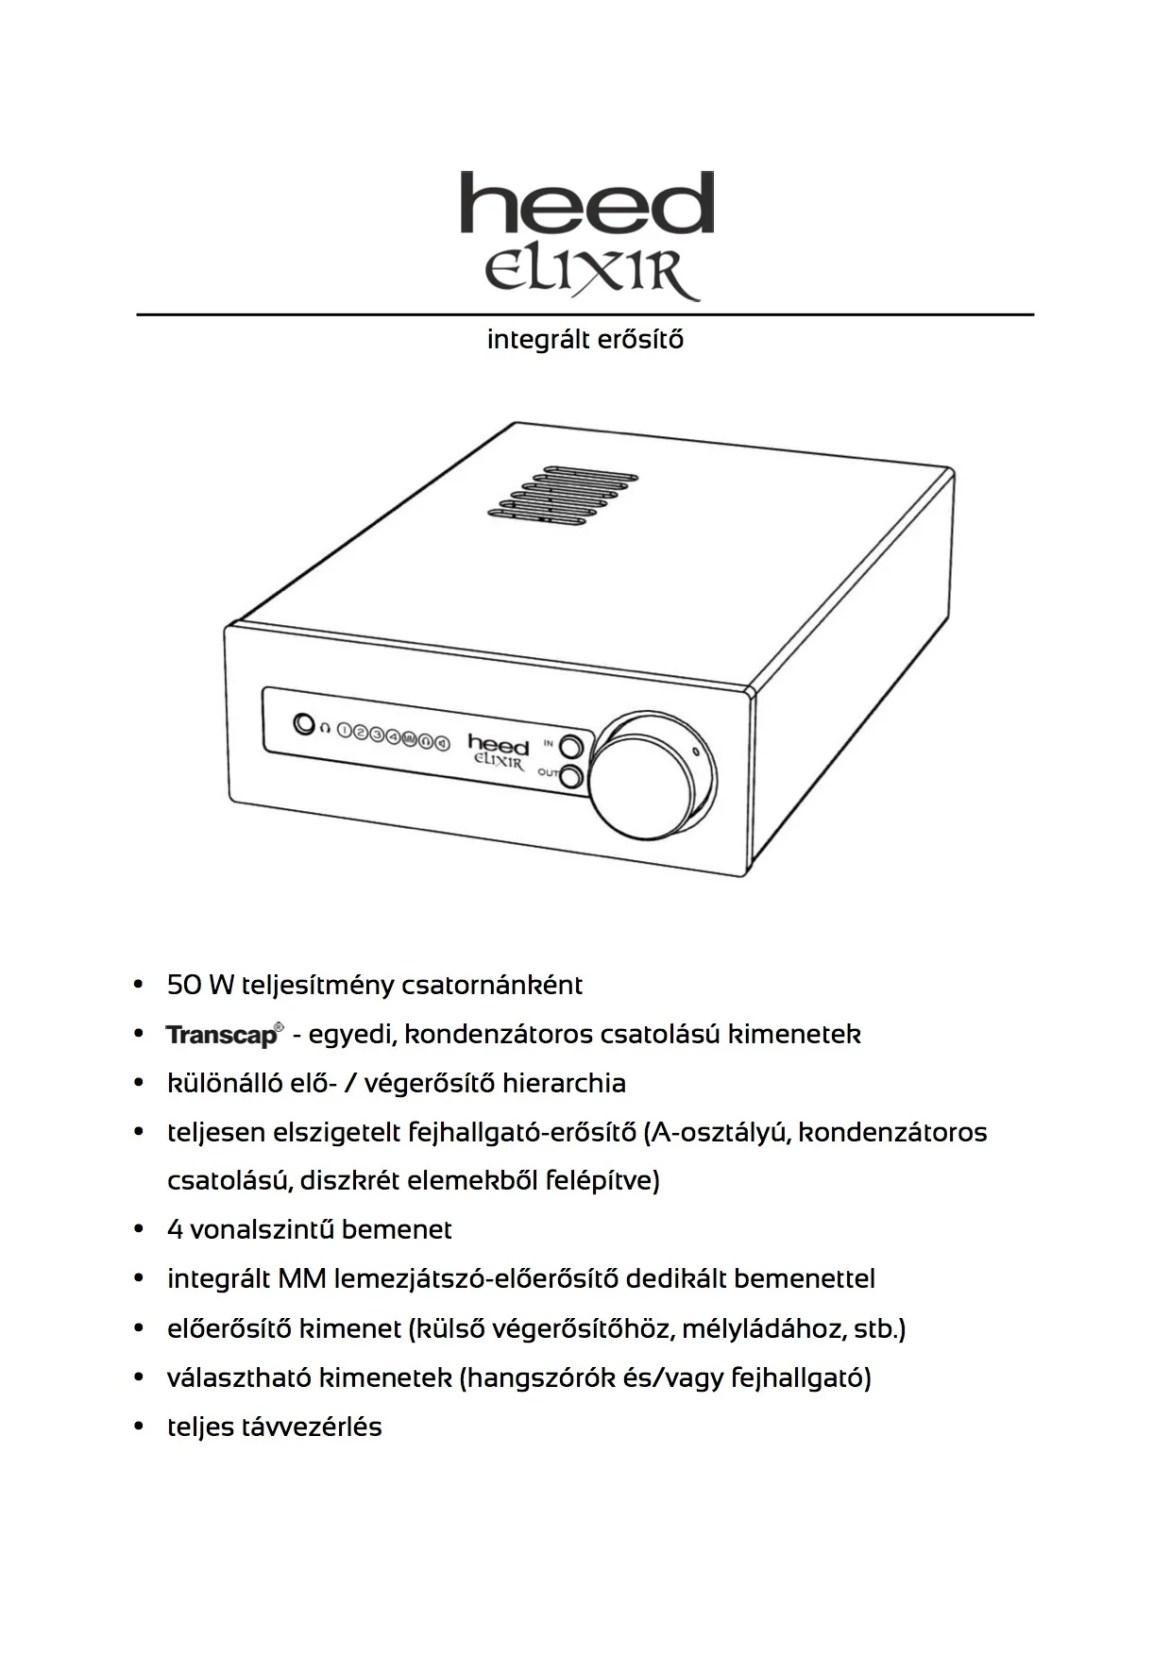 Heed Elixir műszaki adatok